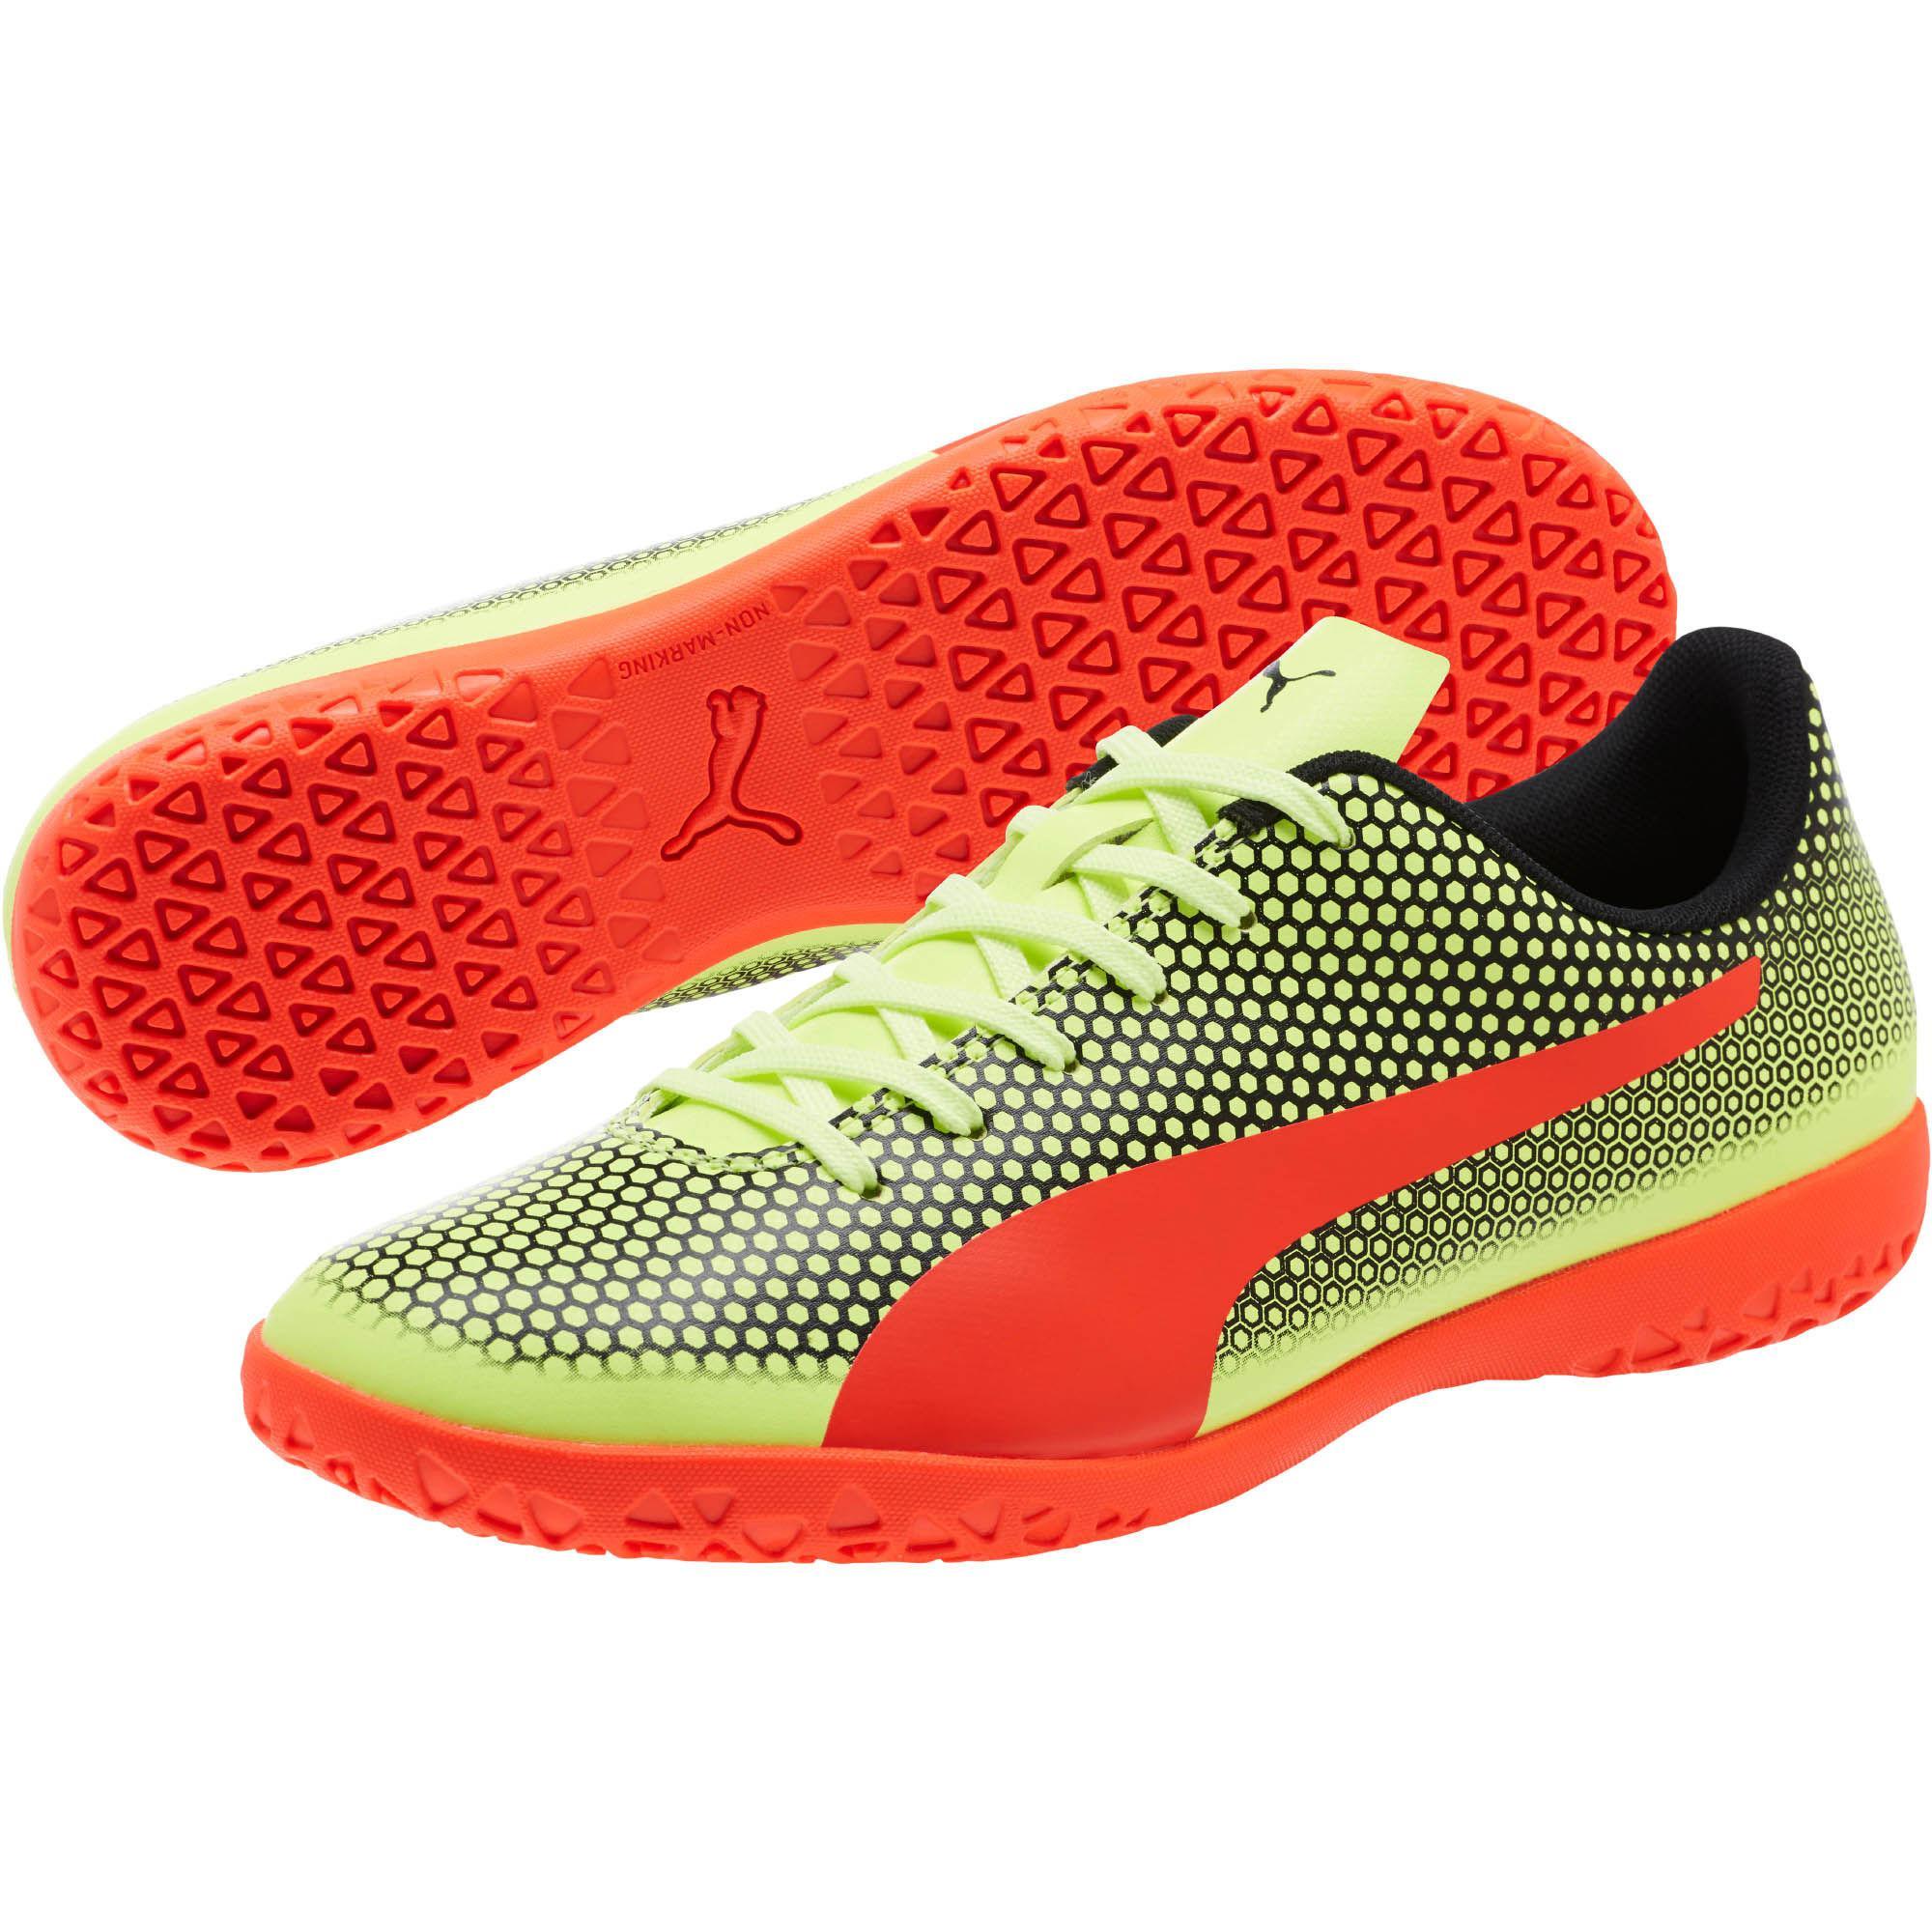 a1875a6a2920 Lyst - PUMA Spirit It Indoor Soccer Shoes for Men